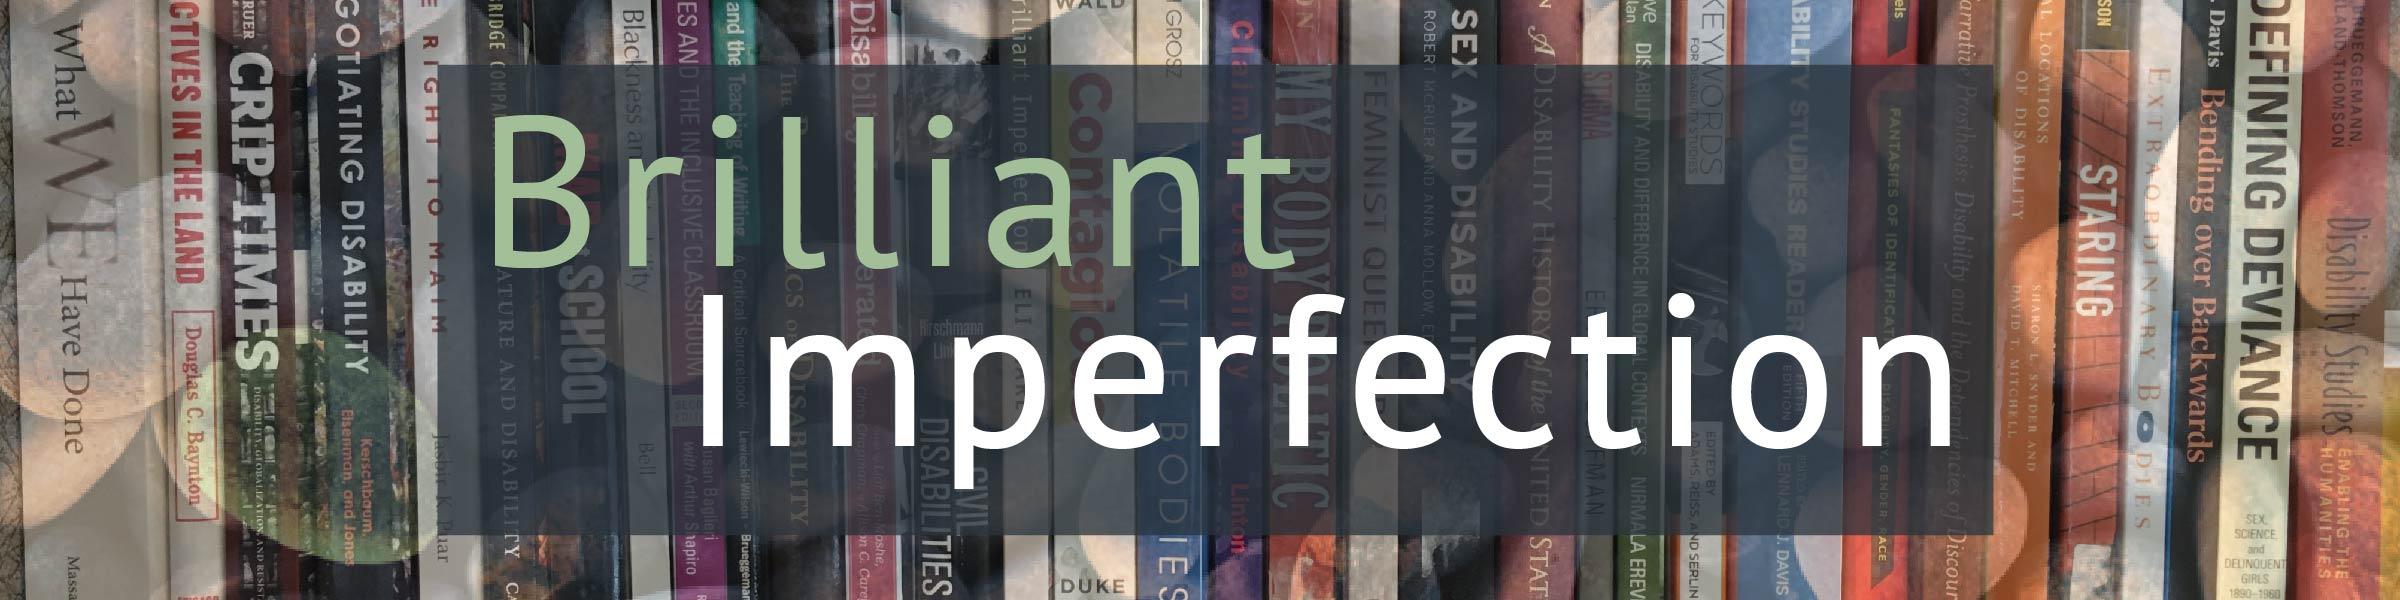 brilliant imperfections